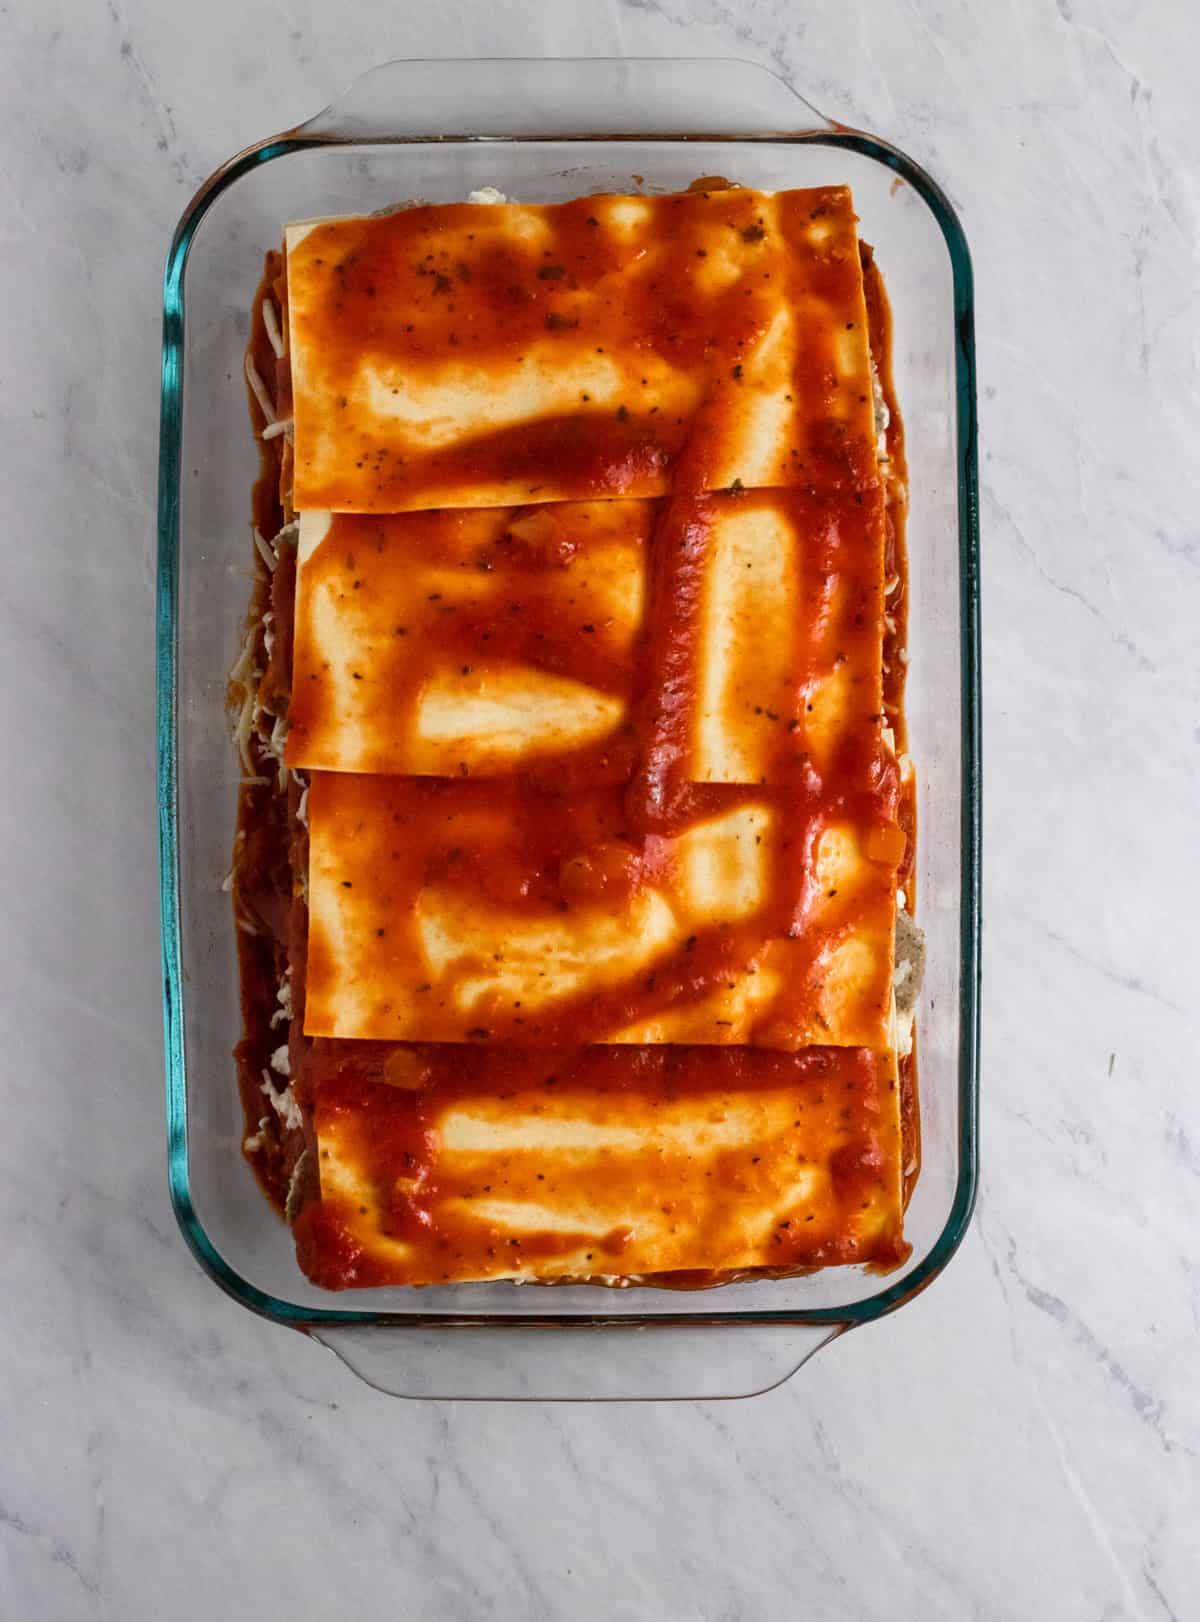 Oven ready lasagna.